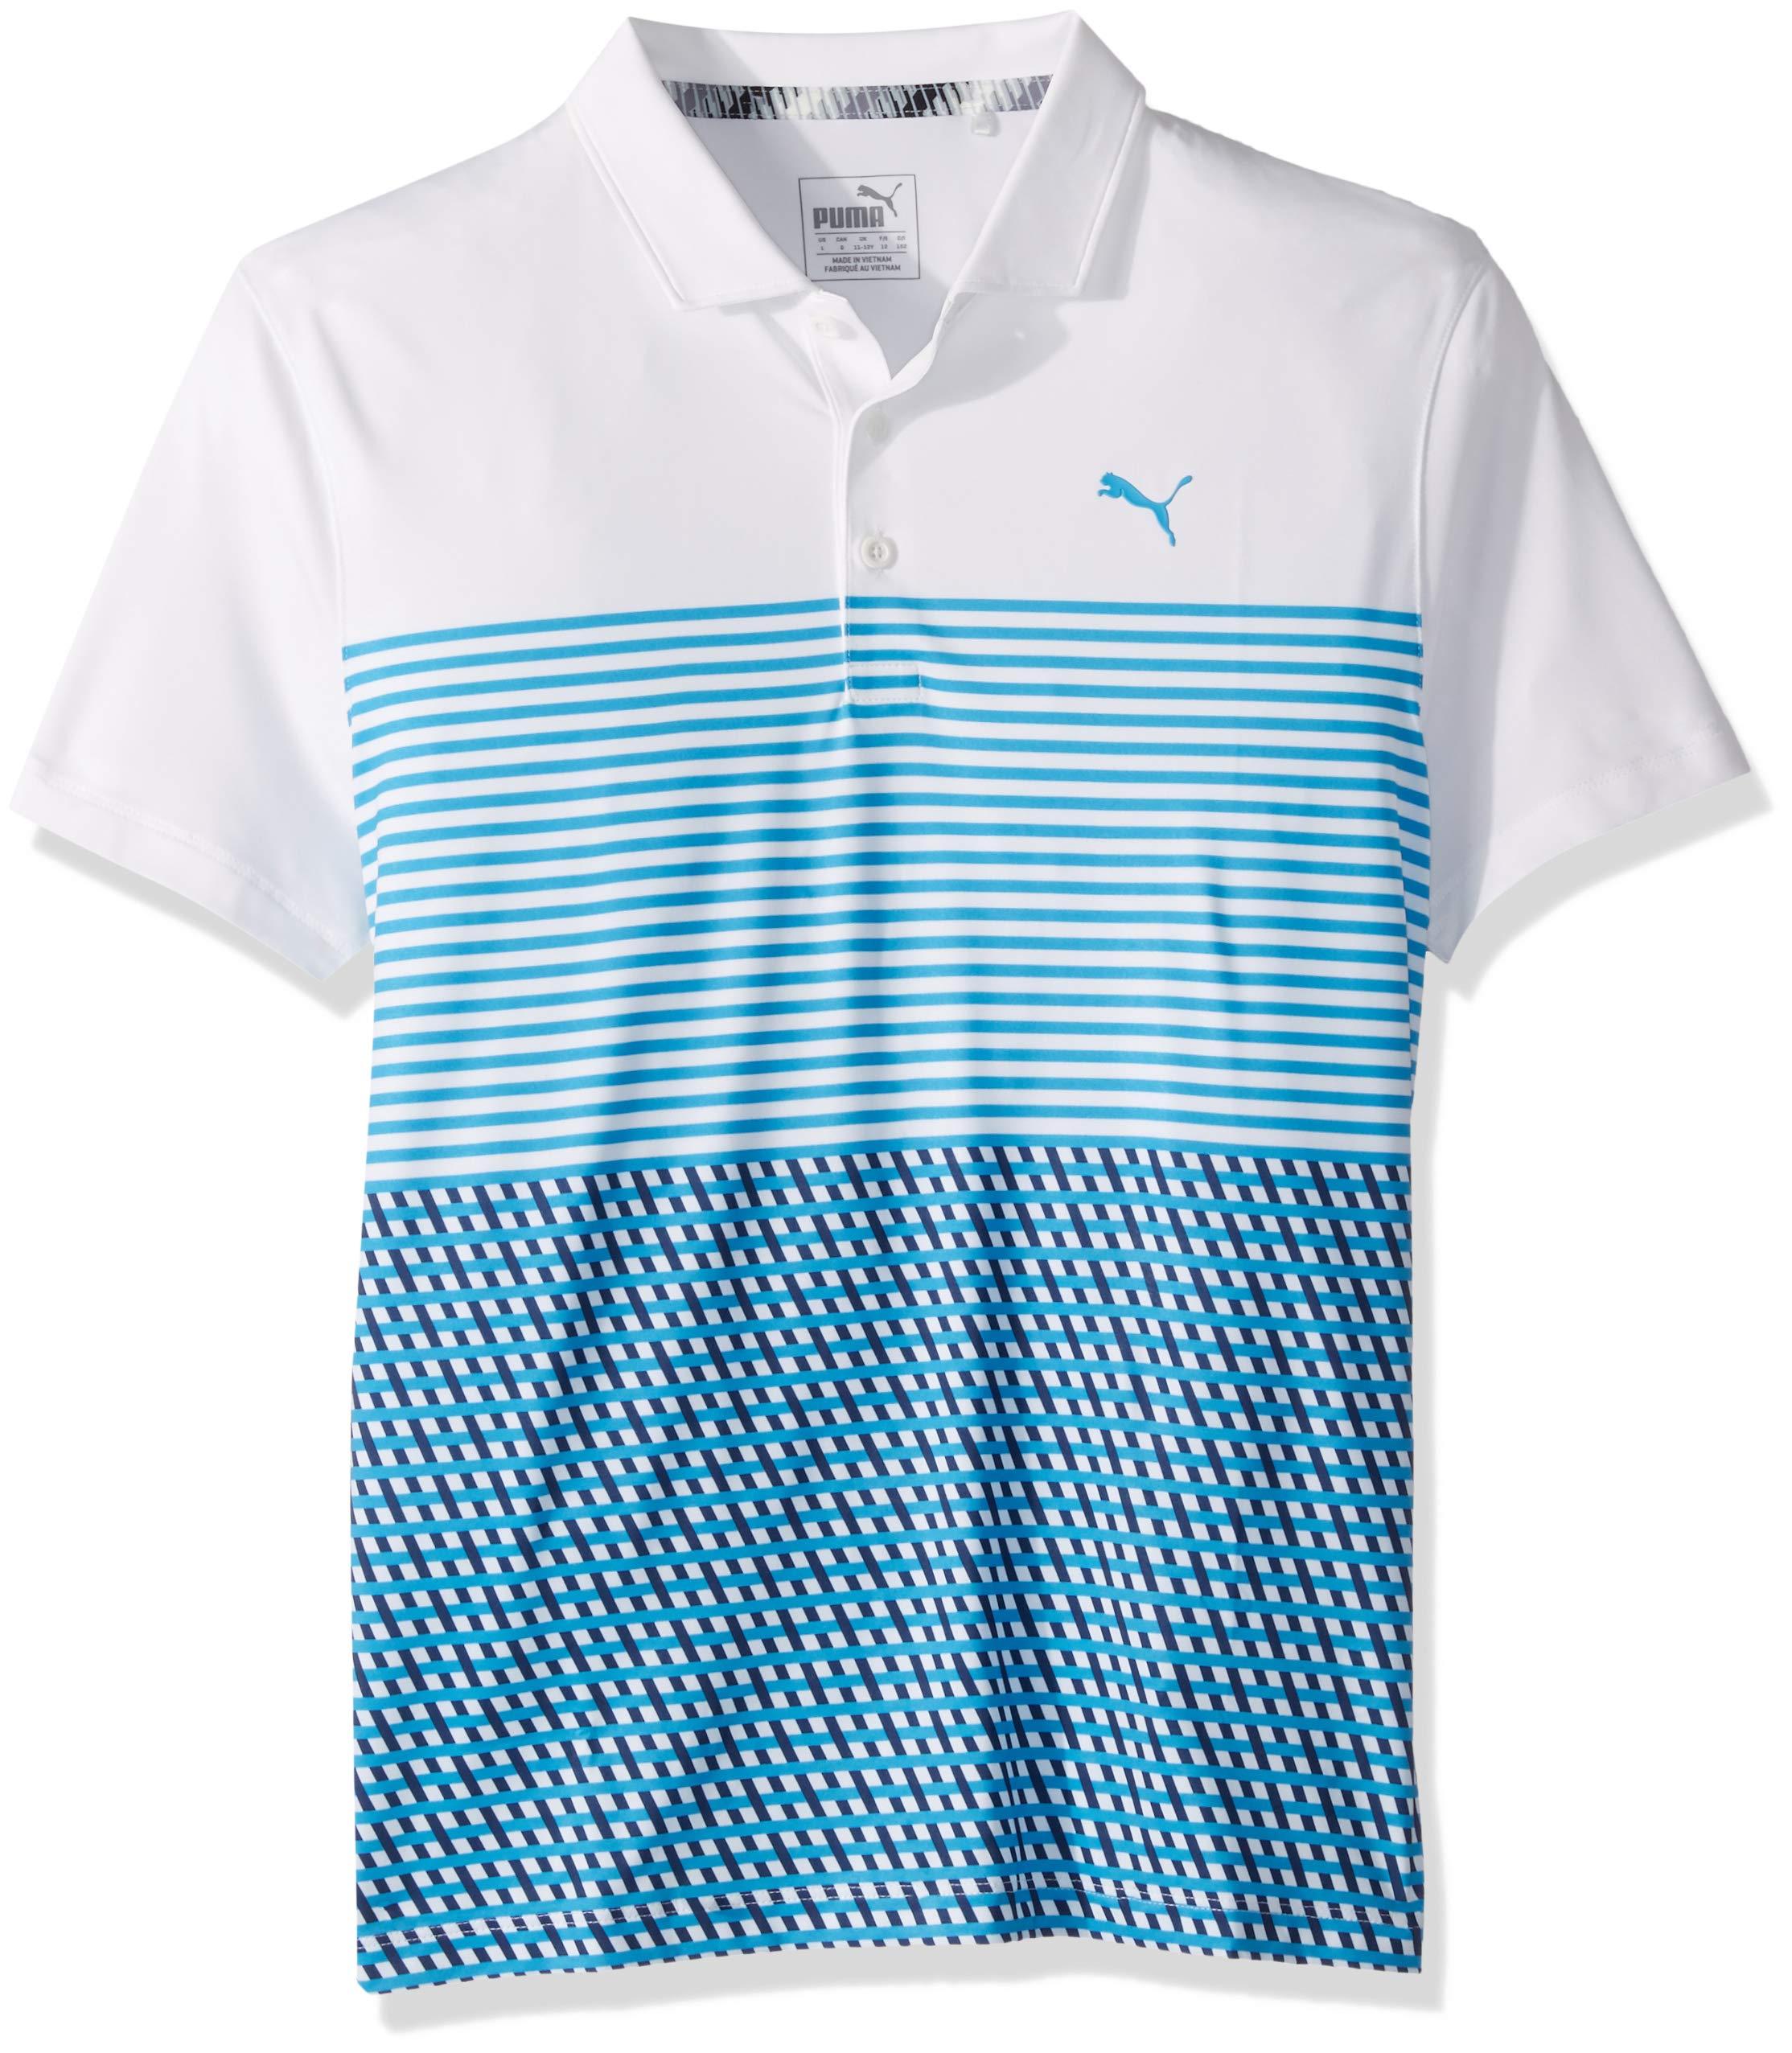 Puma Golf Boys 2019 Road Map Polo, Bright White-Bleu Azure, Medium